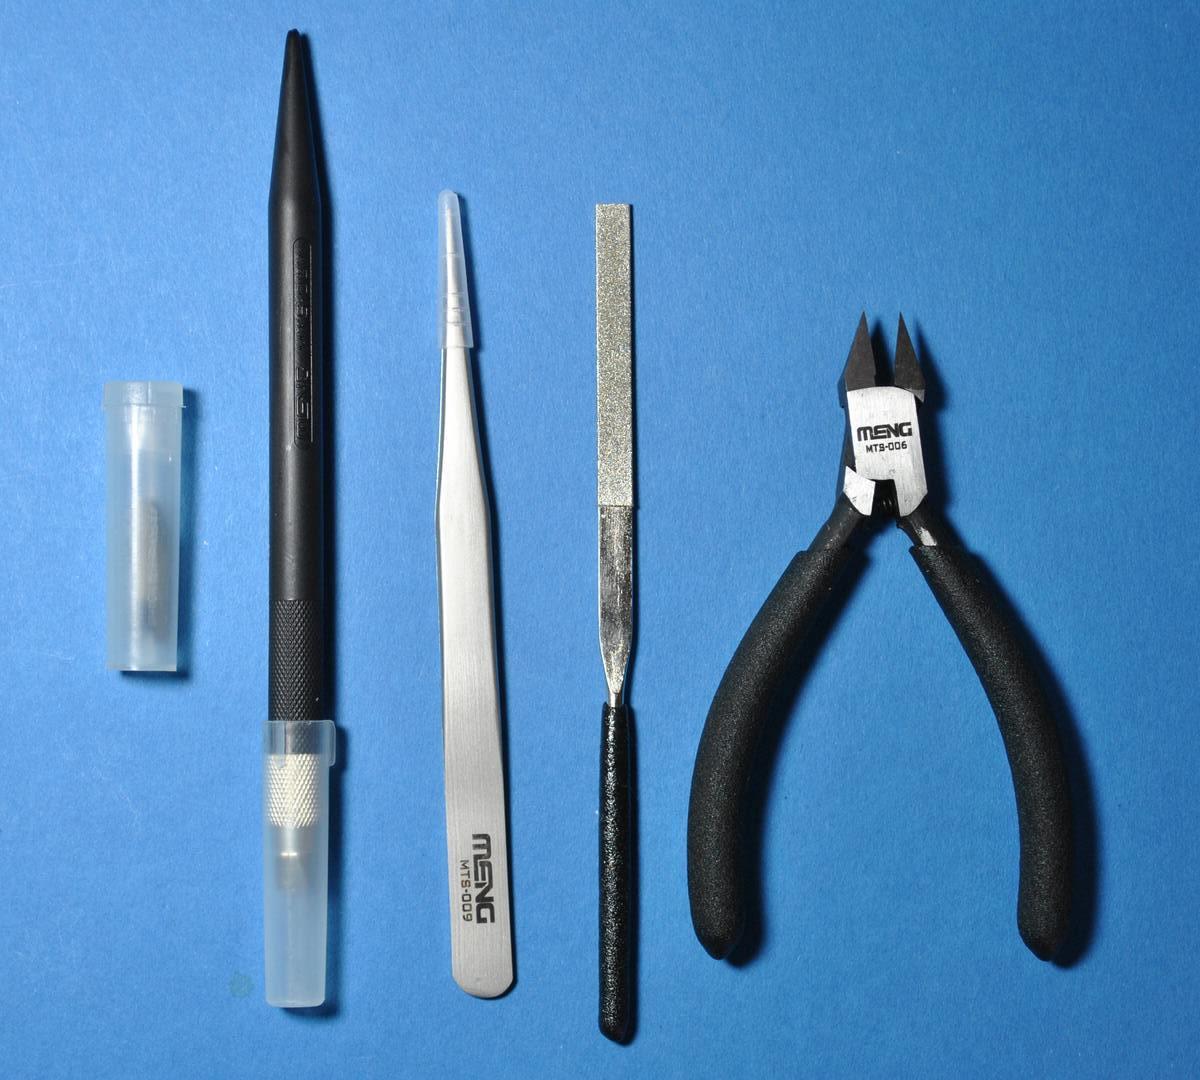 MENG-Werkzeug-1 Basic Hobby Tool von MENG